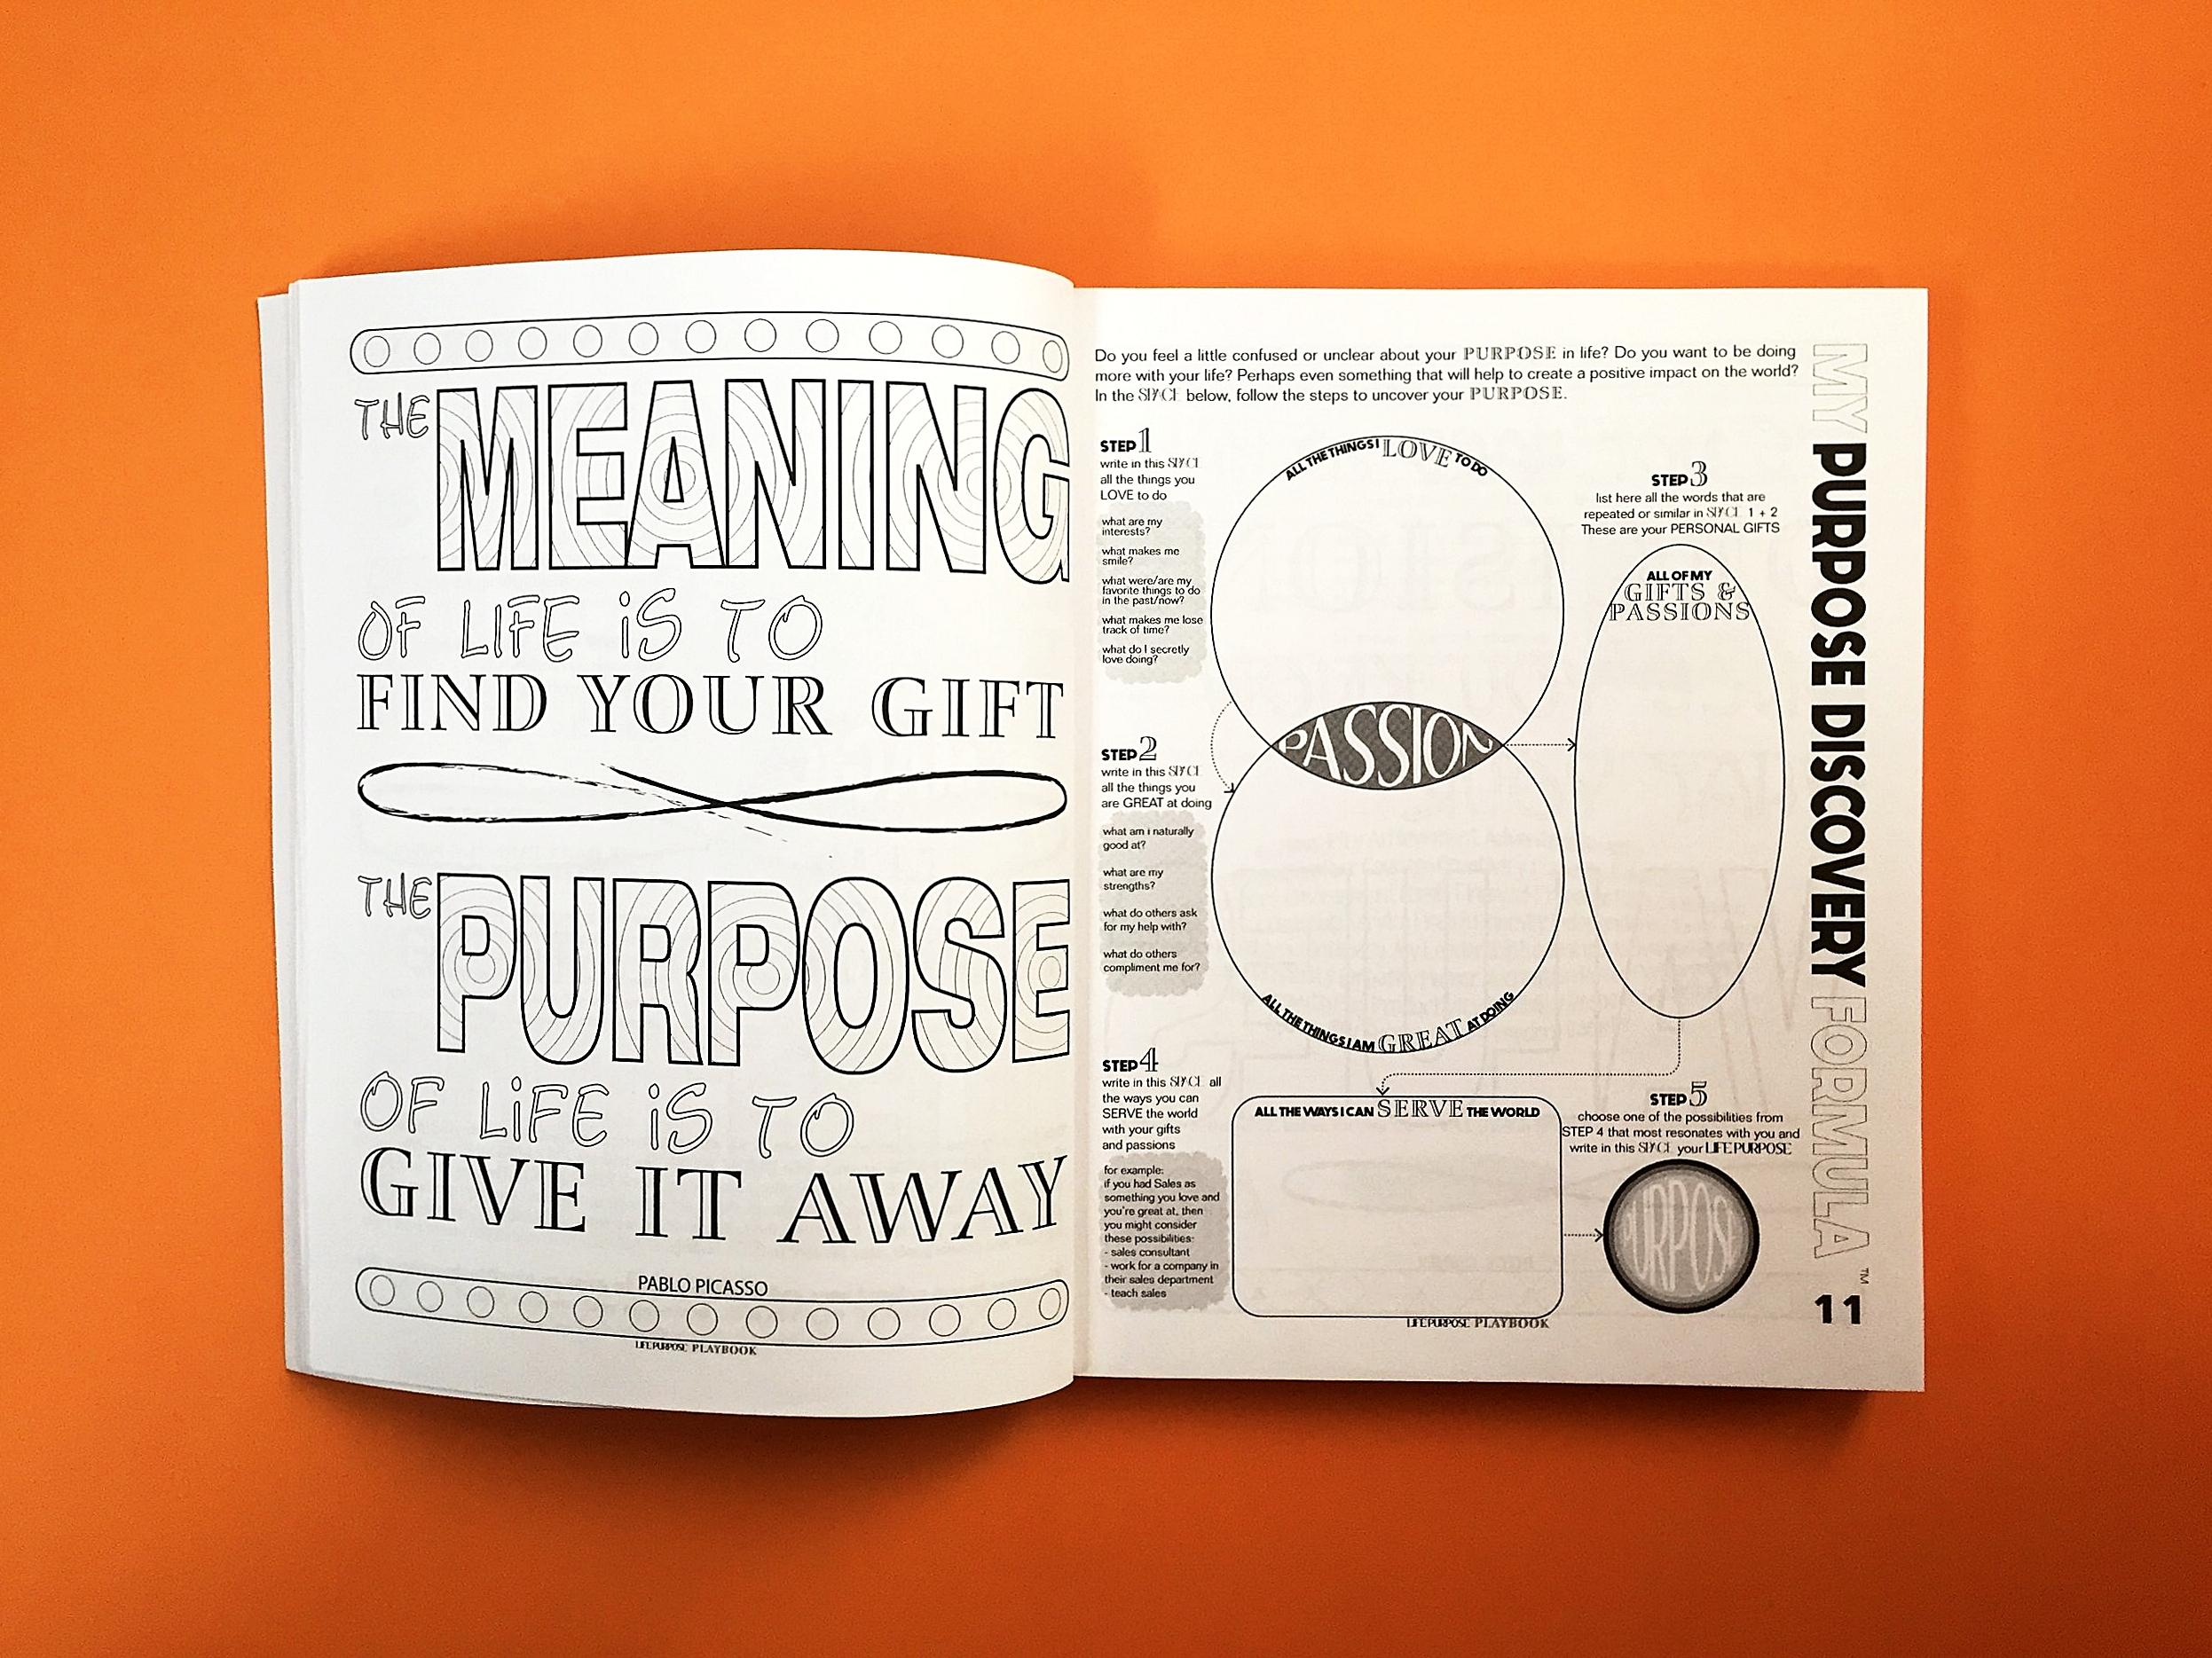 Life Purpose Discovery Formula